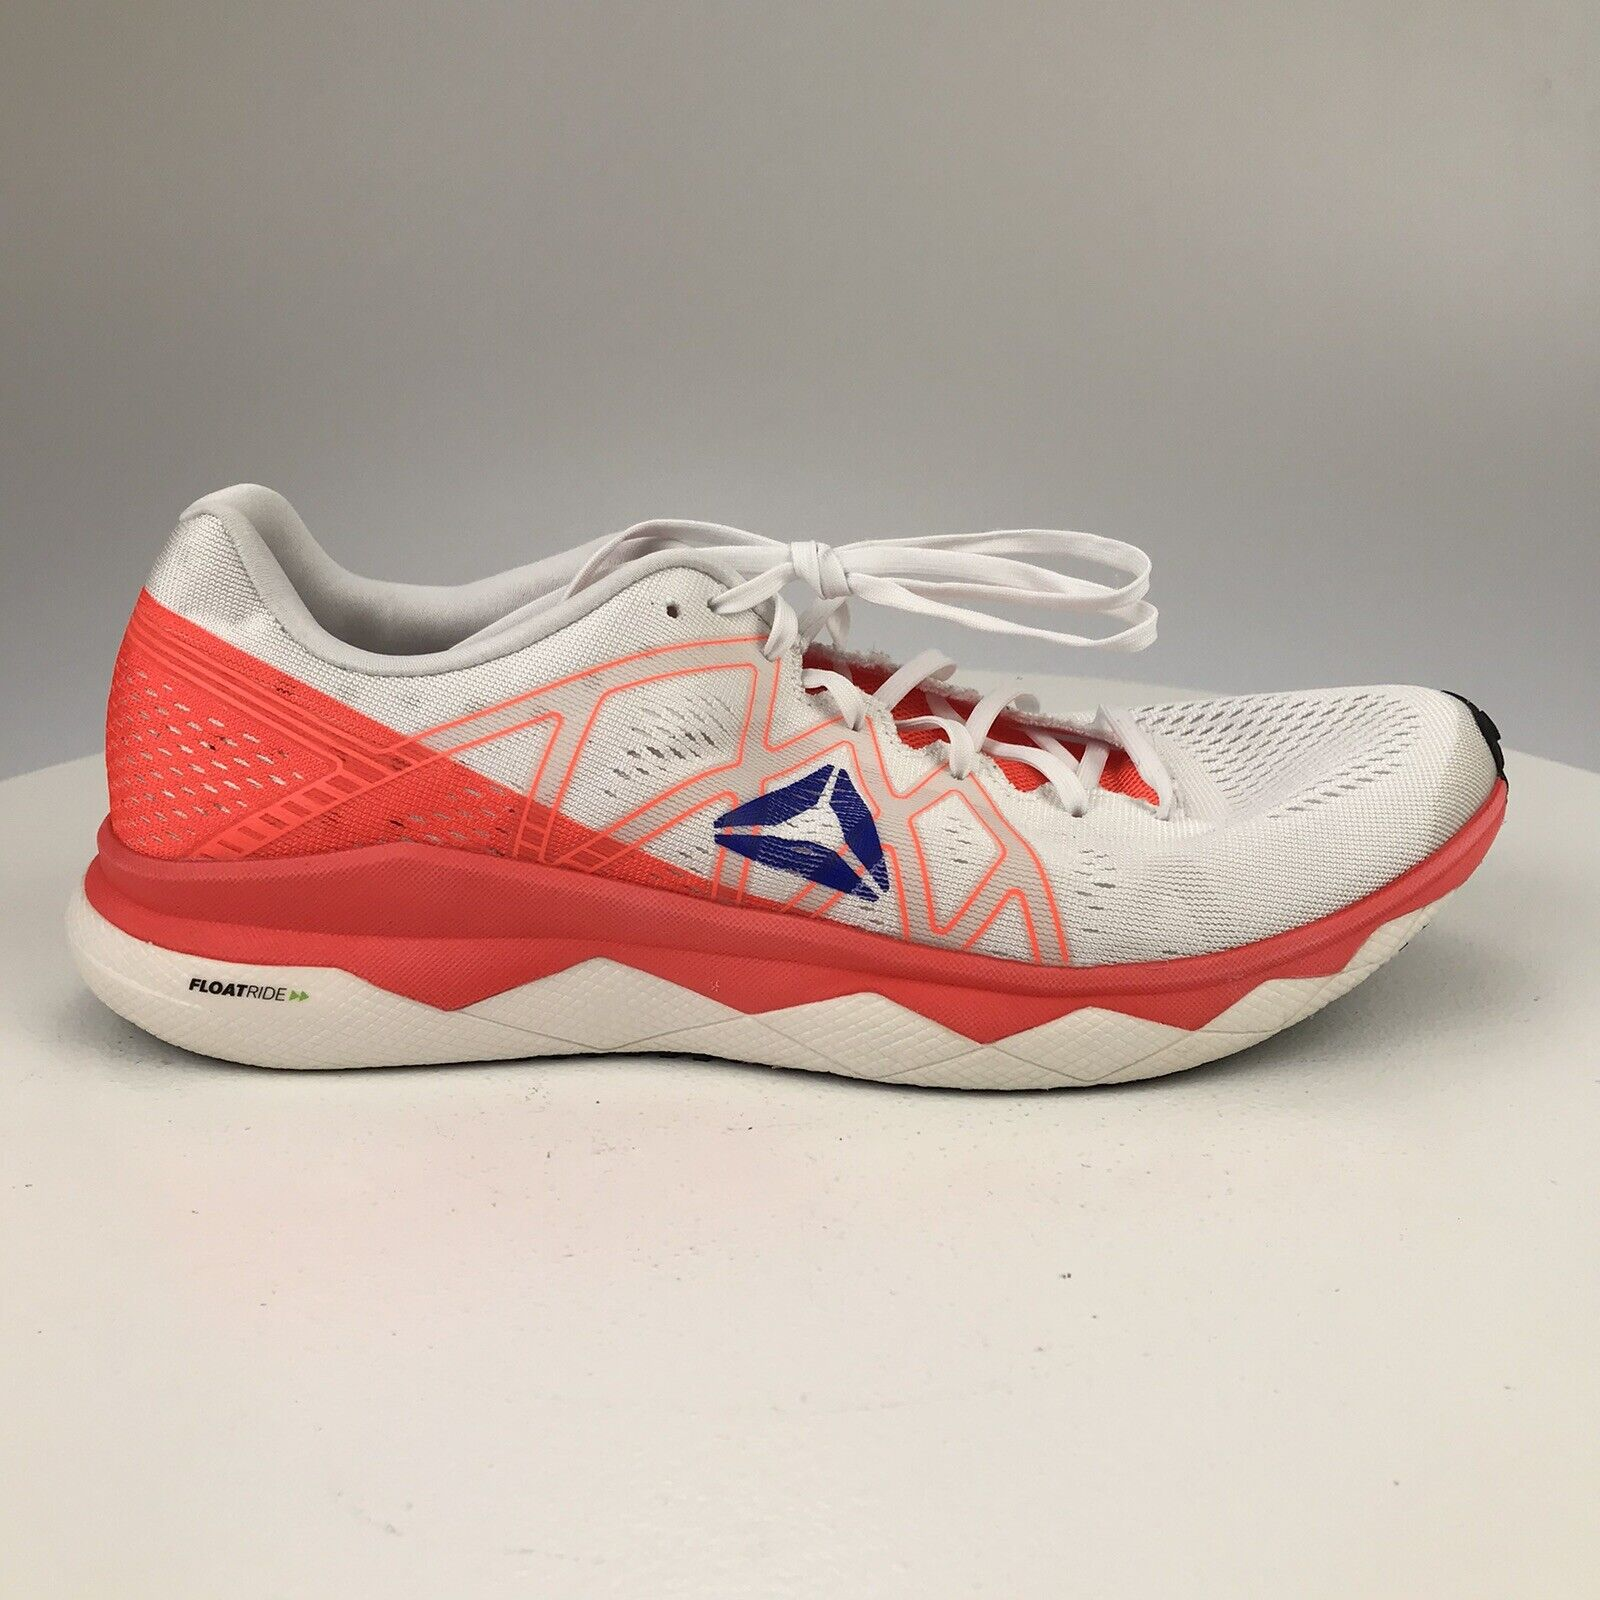 Mens 9.5 Reebok Speed Day Neutral Floatride Run Fast Running Shoes CN4682